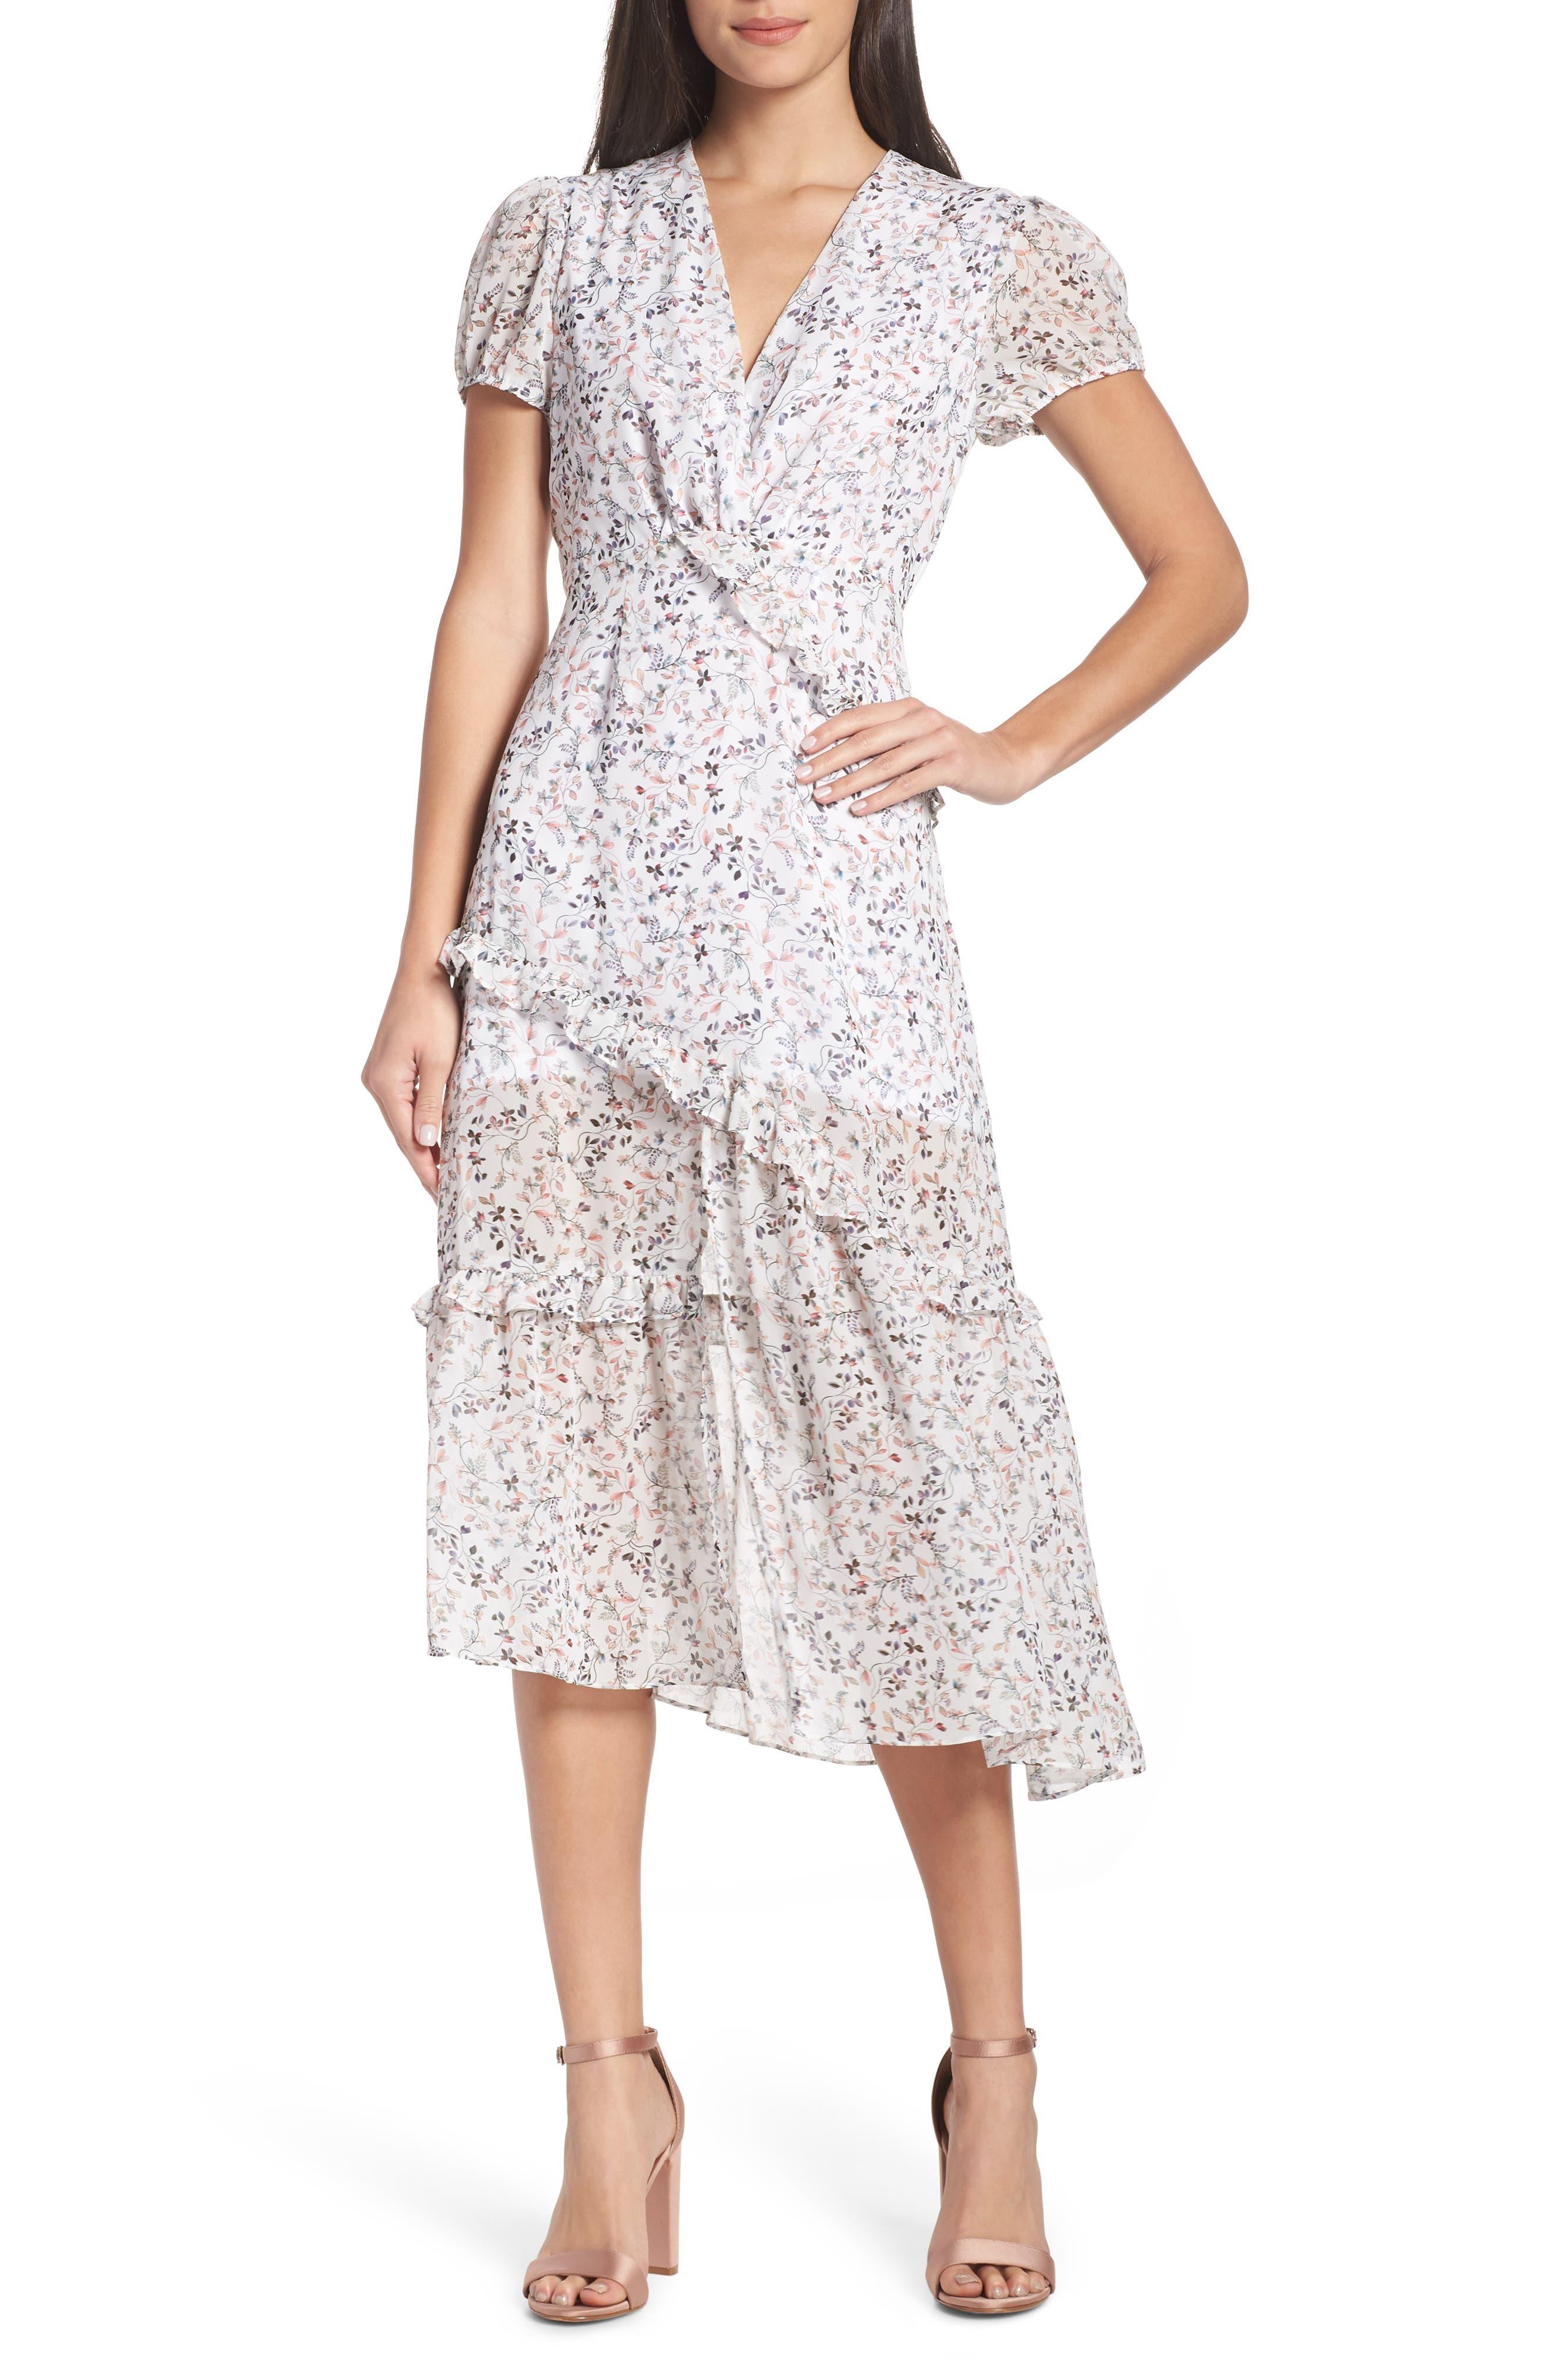 34c4501571 Nsr Olivia Floral Ruffle Midi Dress